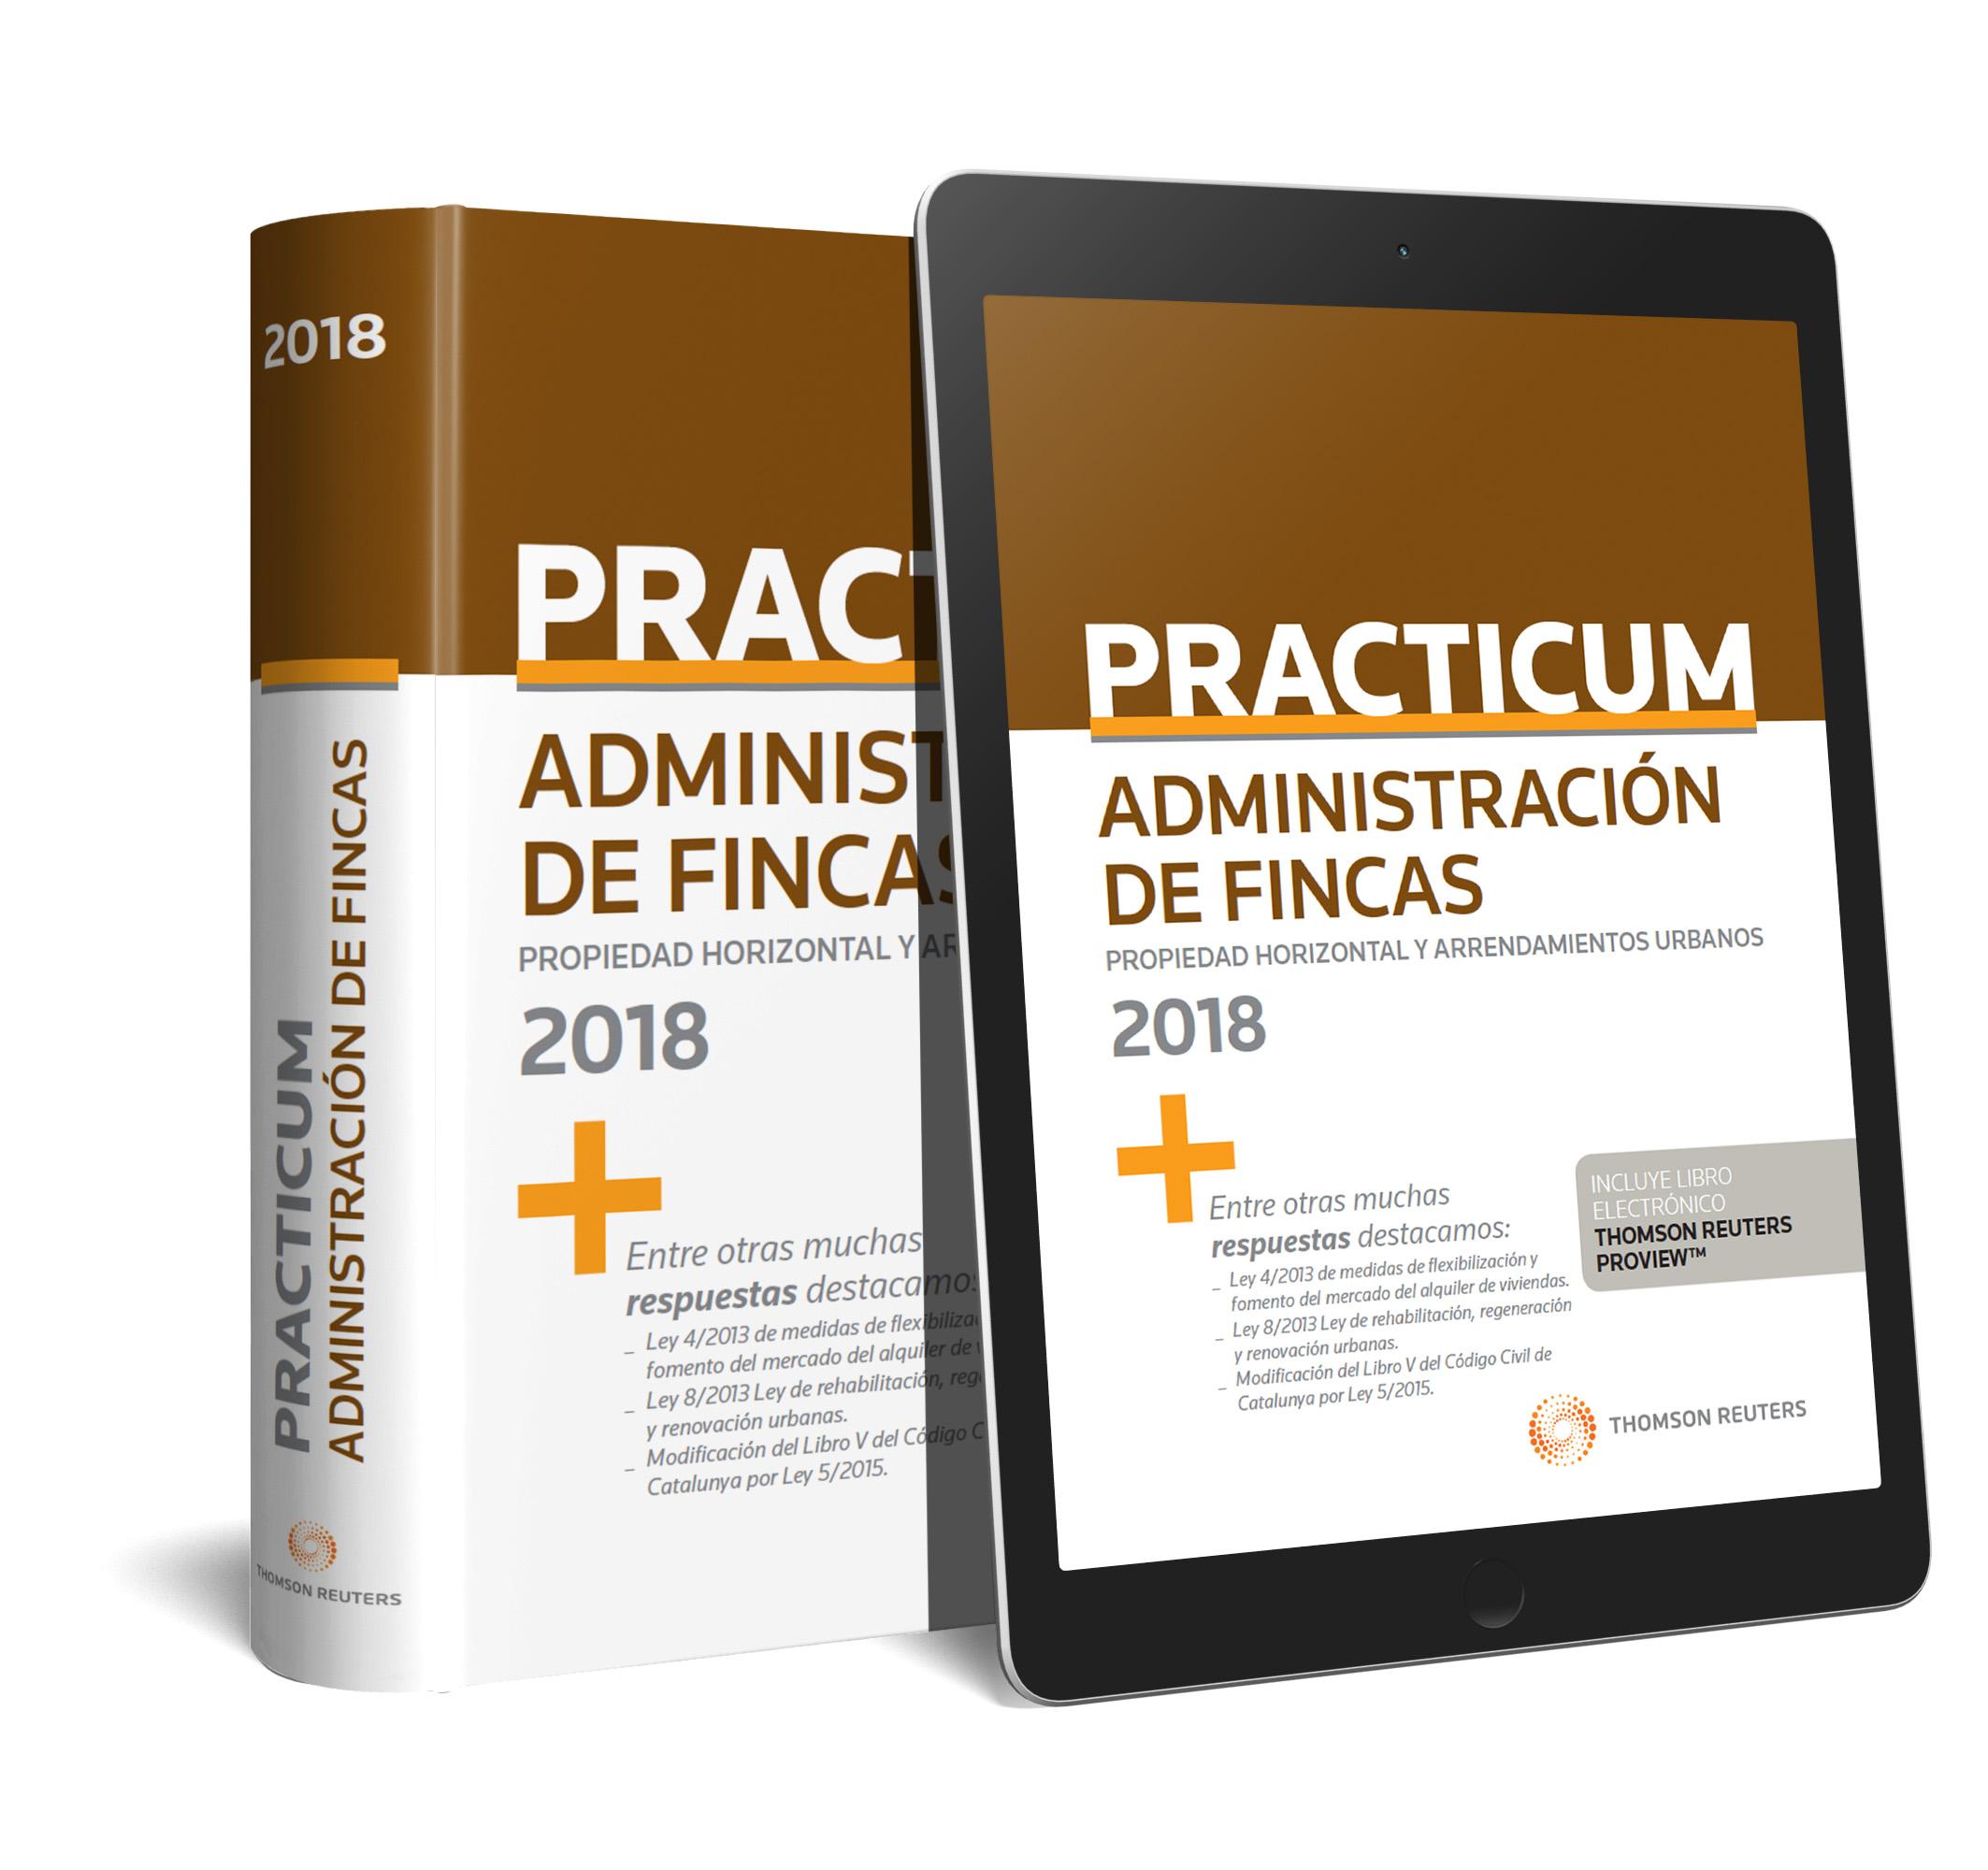 Vvaa sus libros en for Administracion de fincas torrevieja